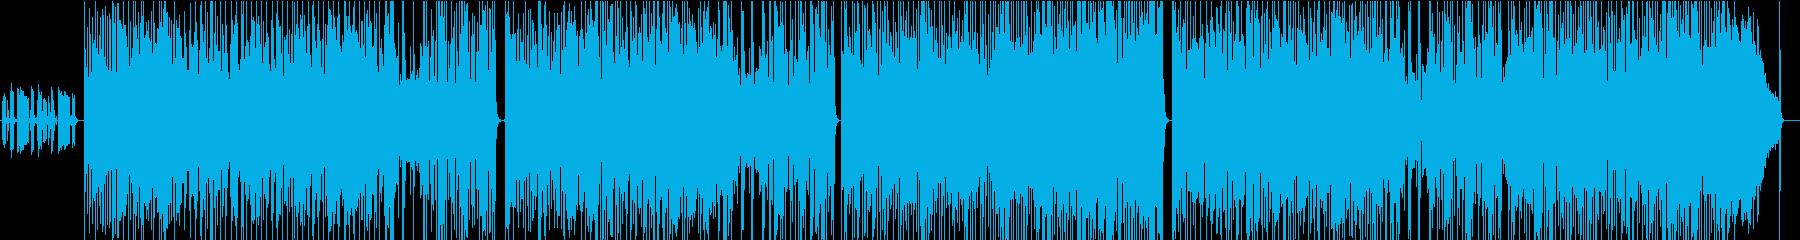 ZZ Topの音楽にインスパイアさ...の再生済みの波形